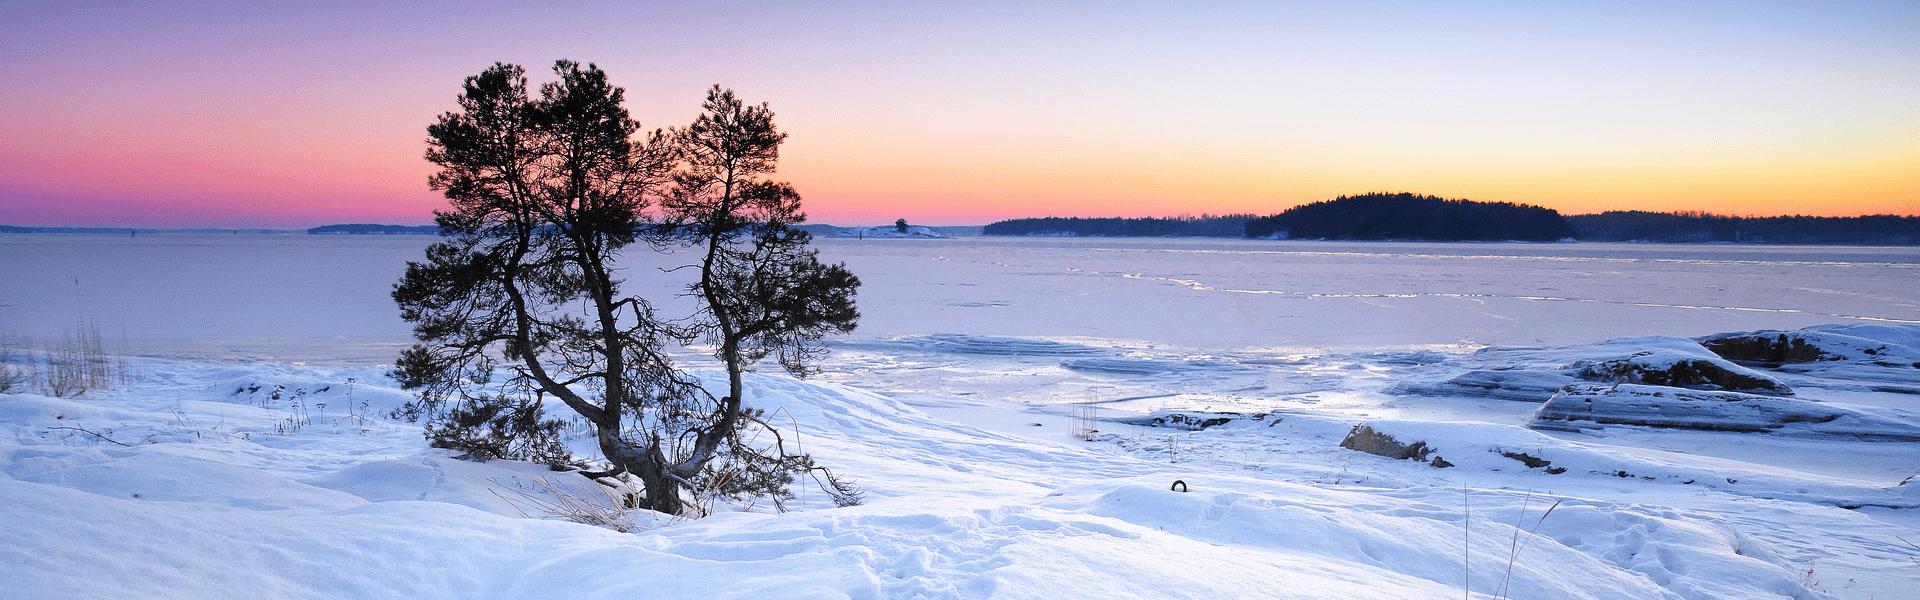 Finland | Winters avontuur in Noord Lapland